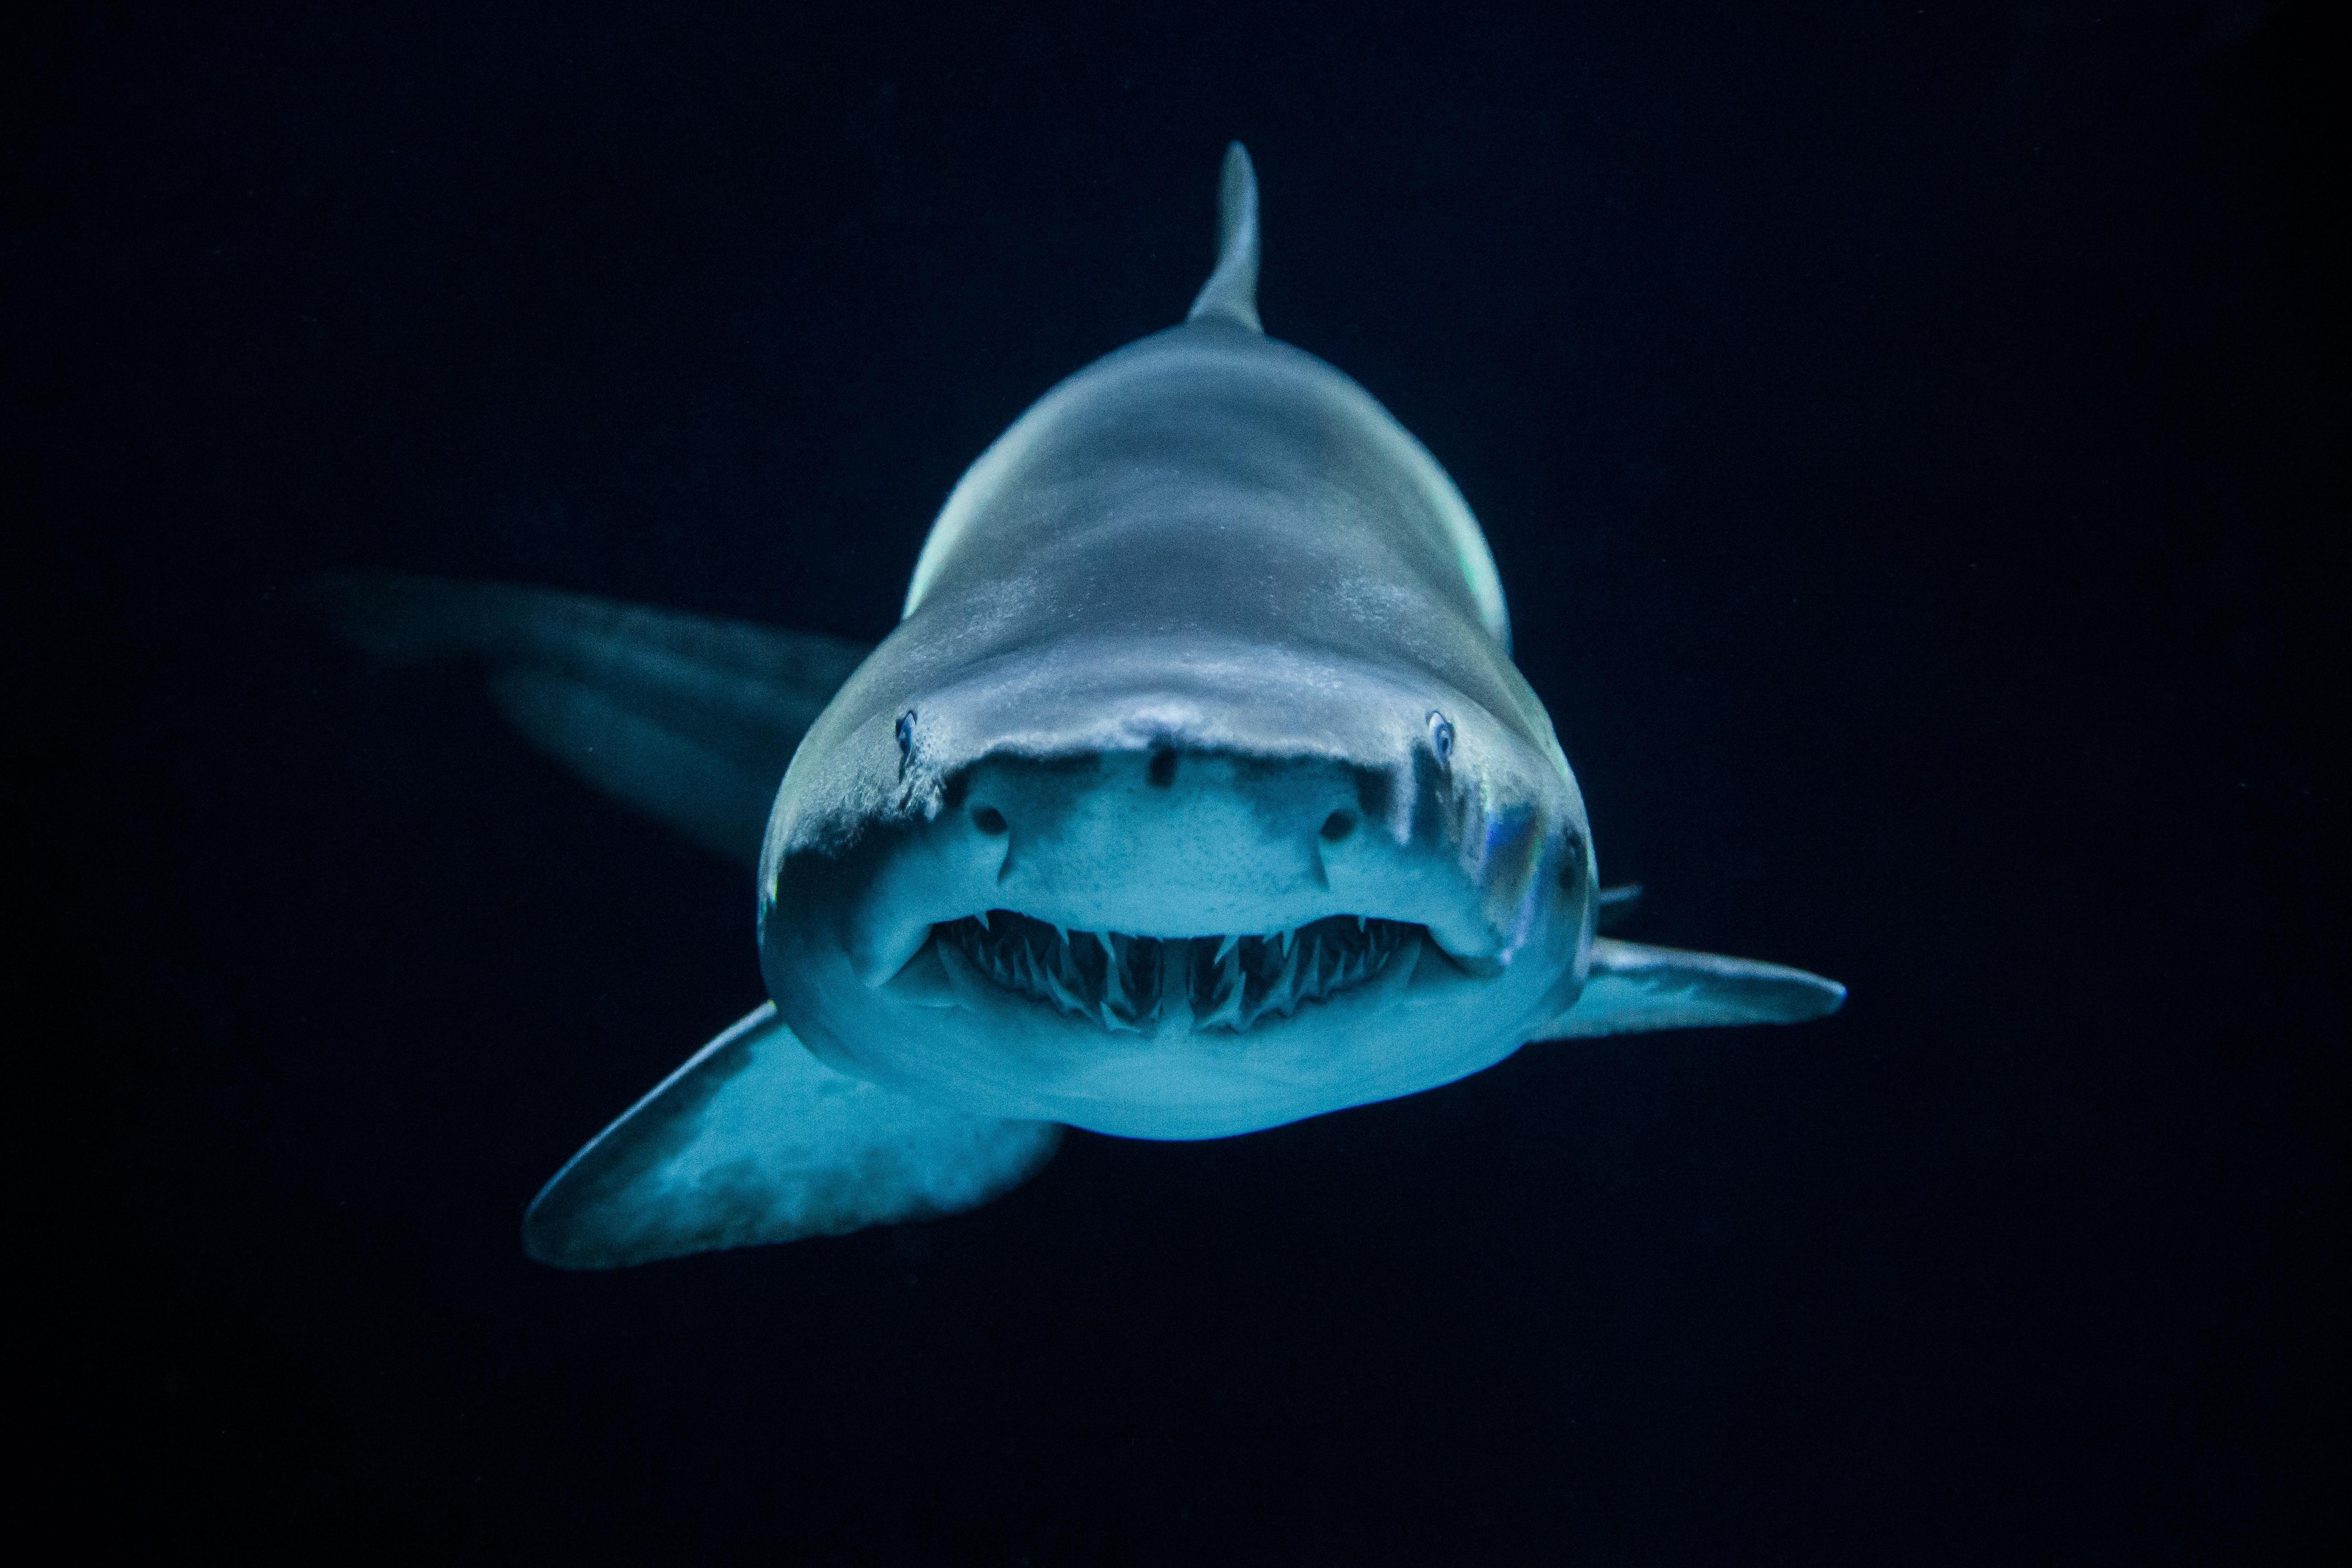 7ae156f3a0c3044c57b5763af826c41d Frais De Aquarium Osaka Concept